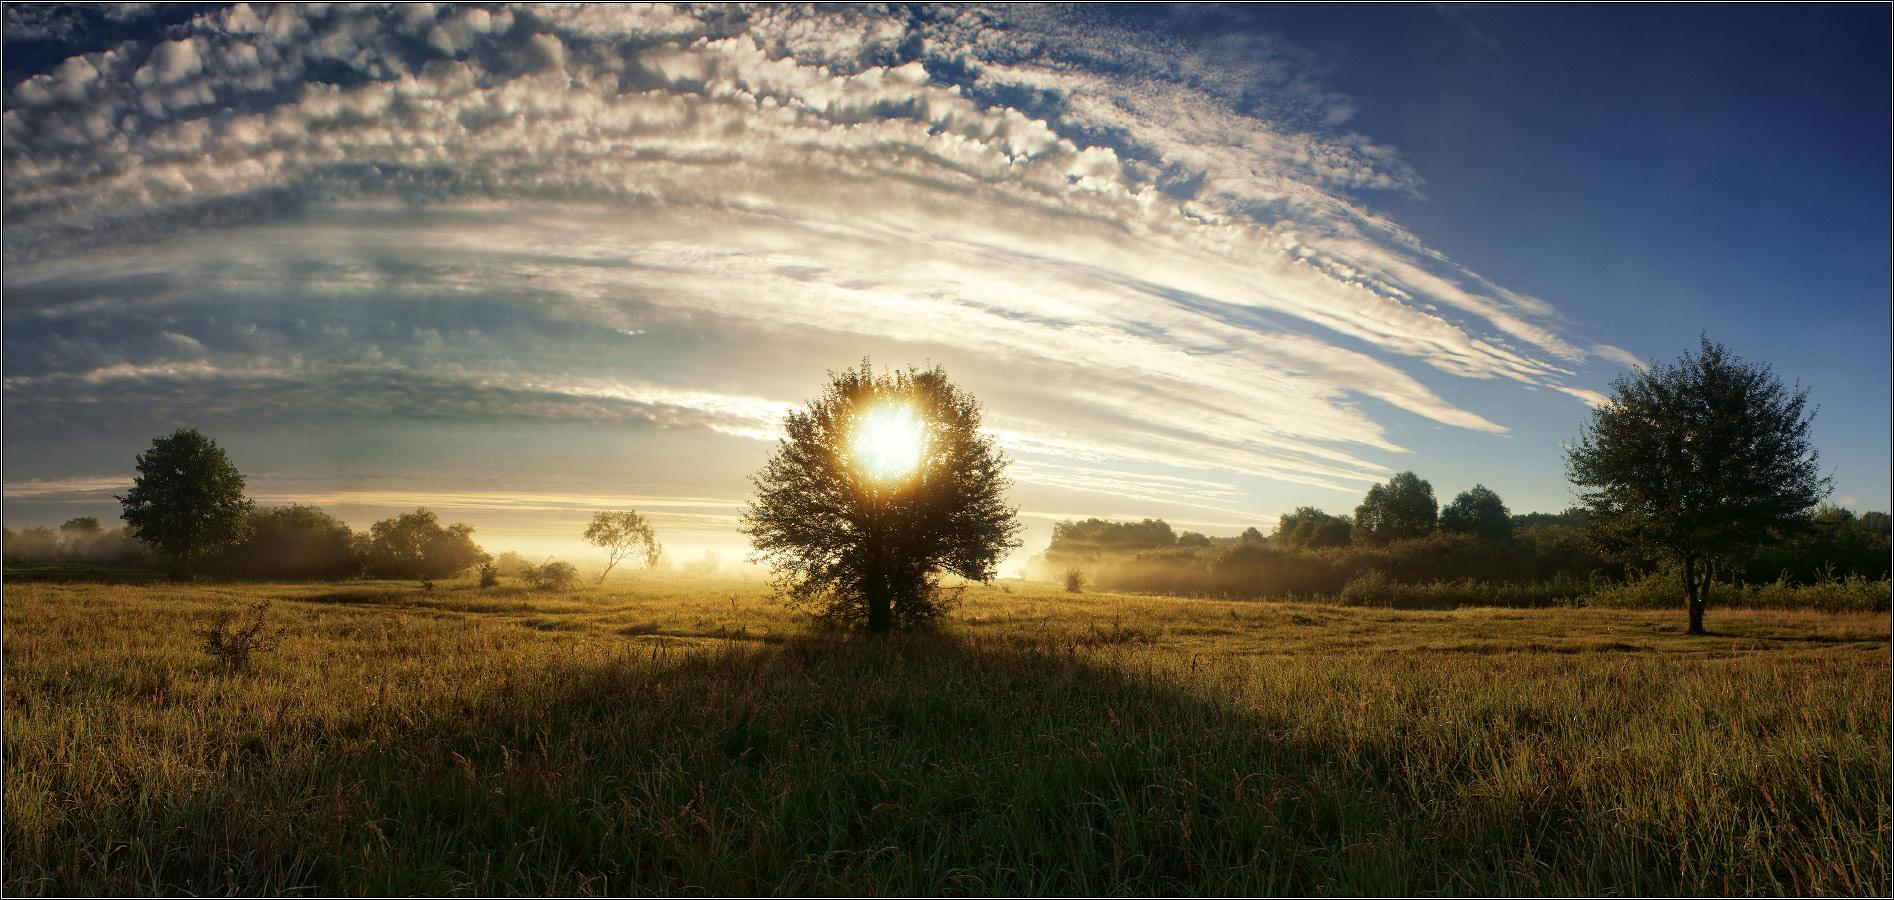 http://i4.imageban.ru/out/2012/07/30/7ccf7975edeae79ef8c1c8d0b6790c09.jpg